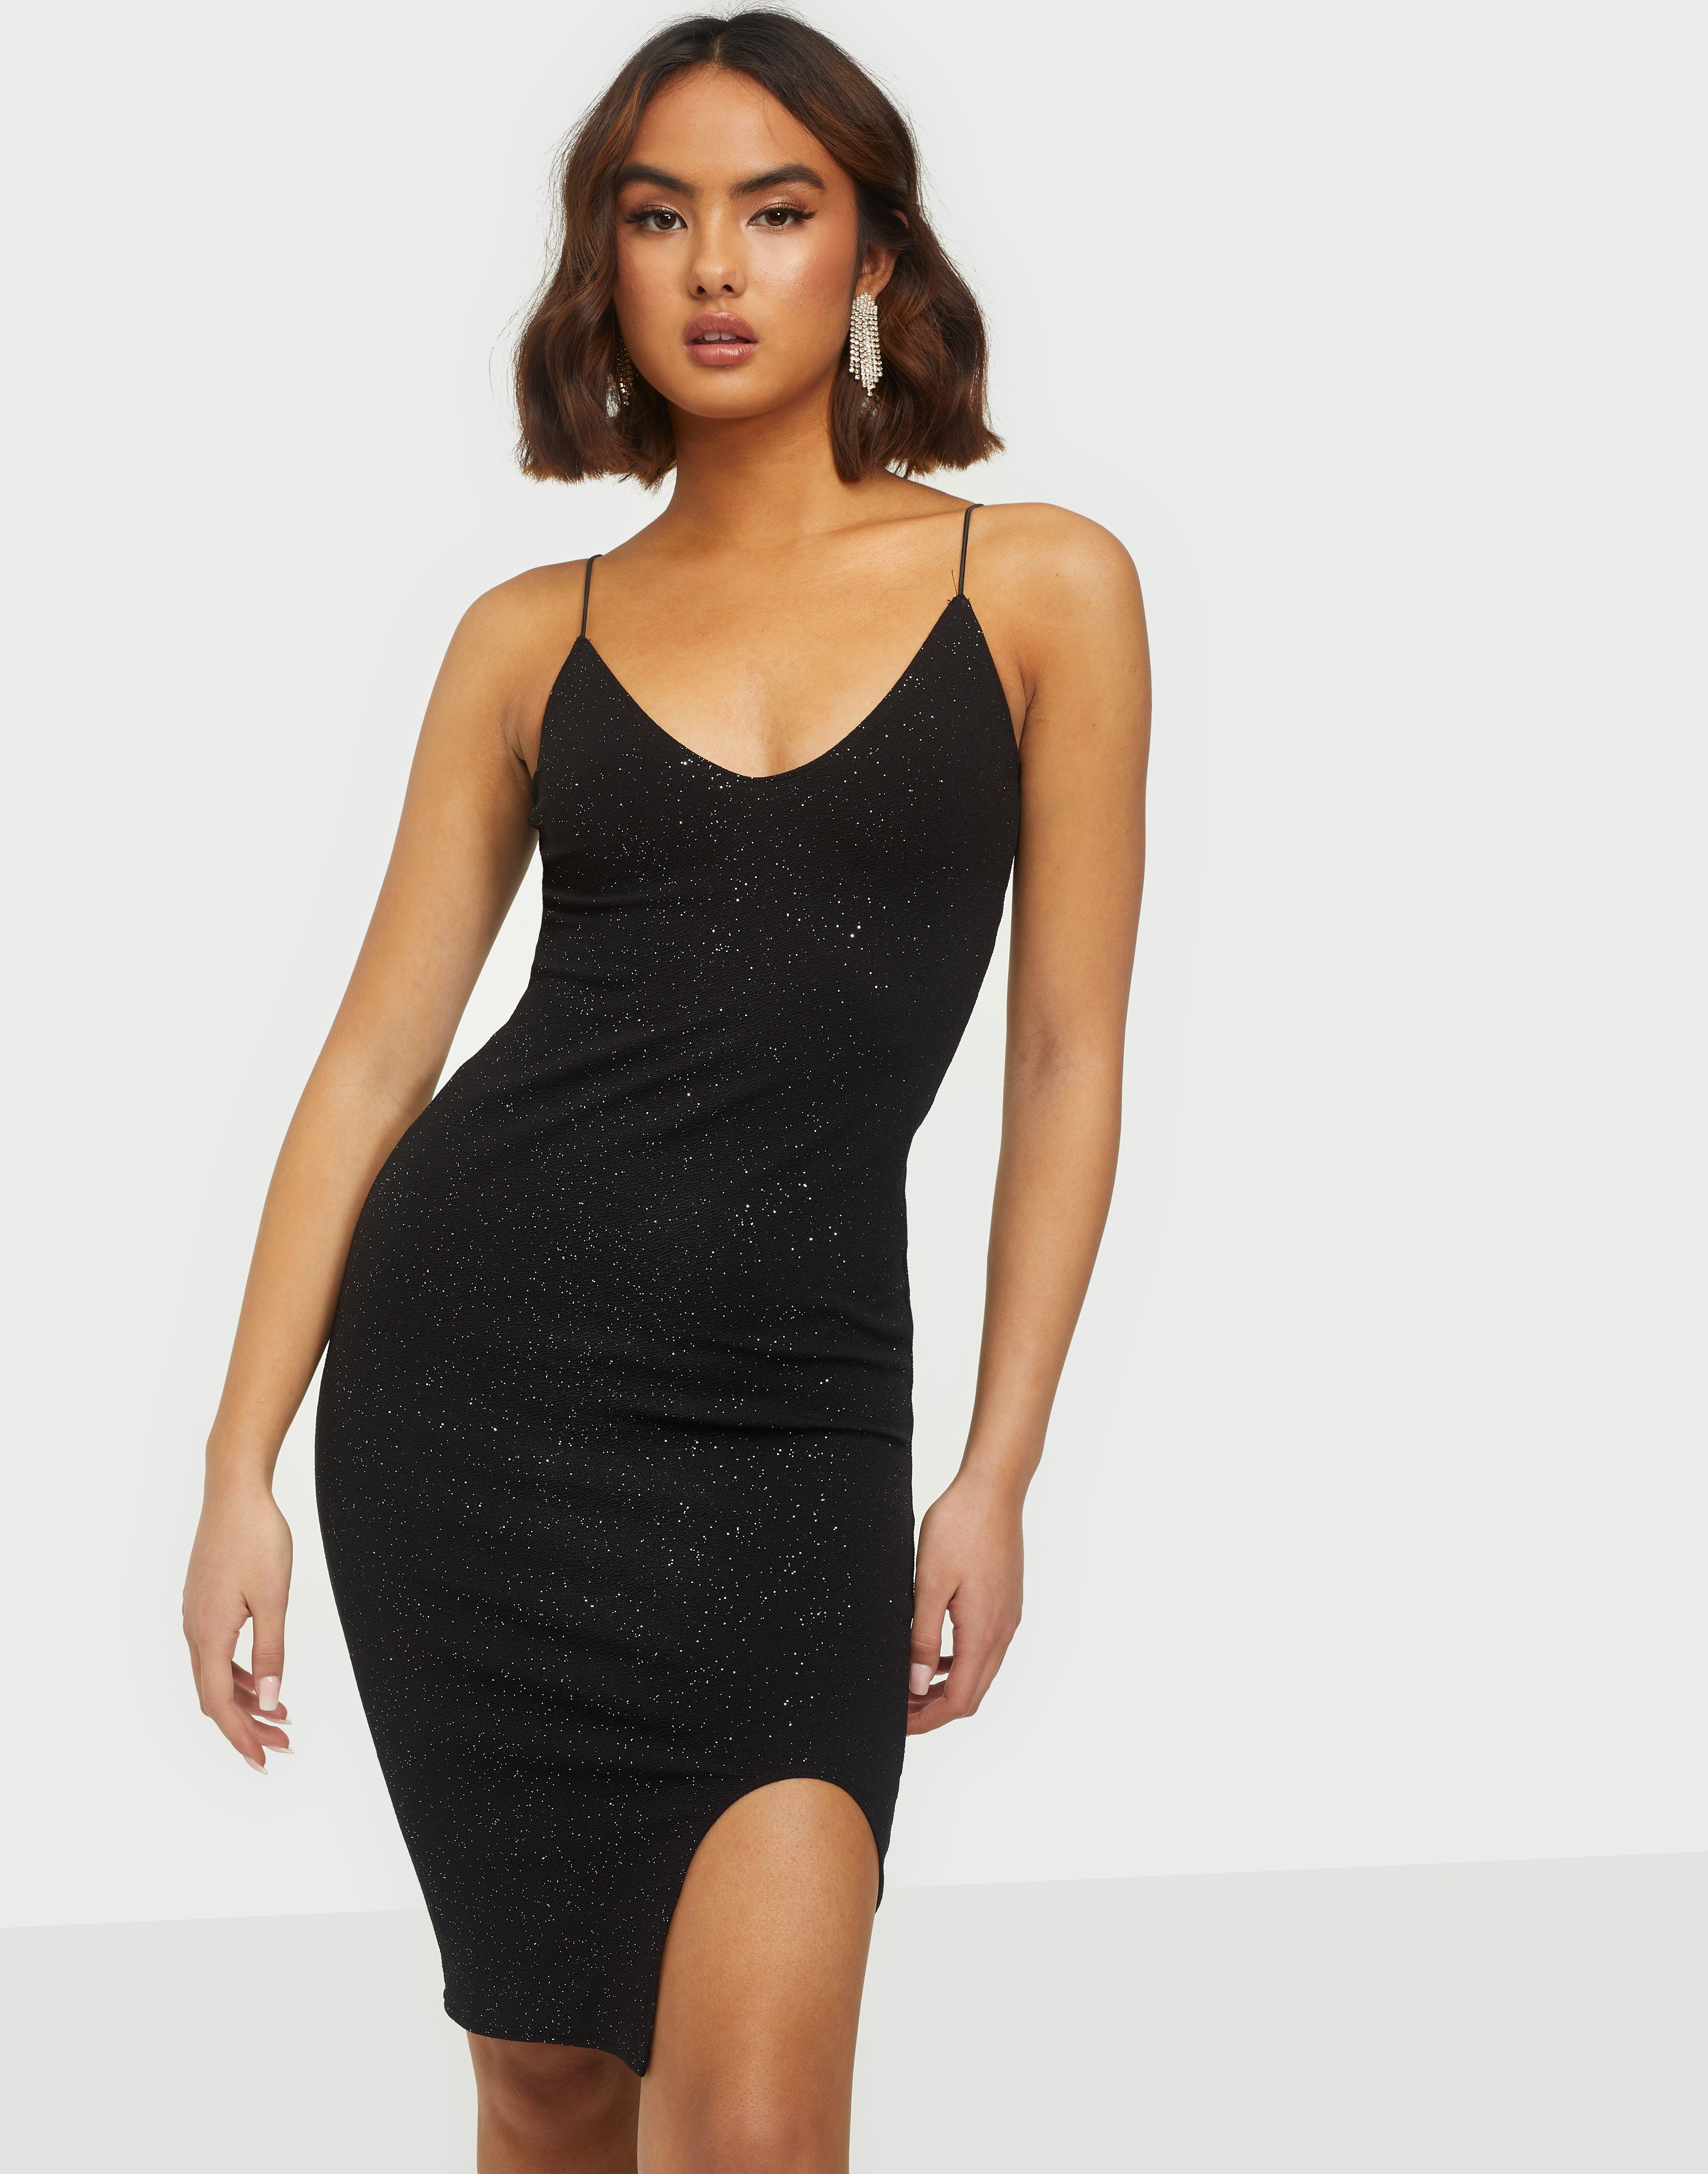 Black Sparkly Dress